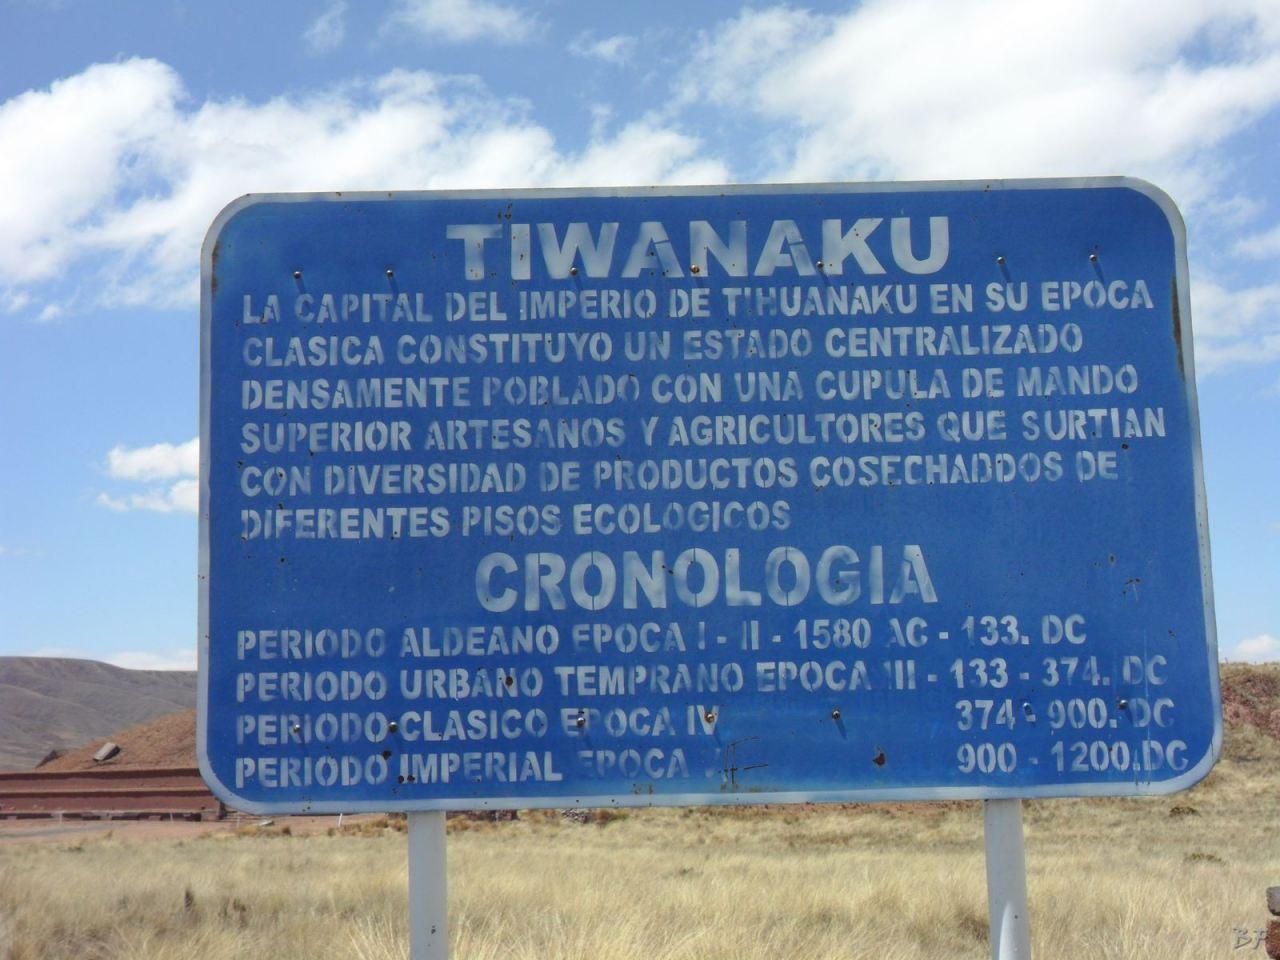 Sito-Megalitico-Piramide-Akapana-Kalasasaya-Menhir-Tiahuanaco-Bolivia-5